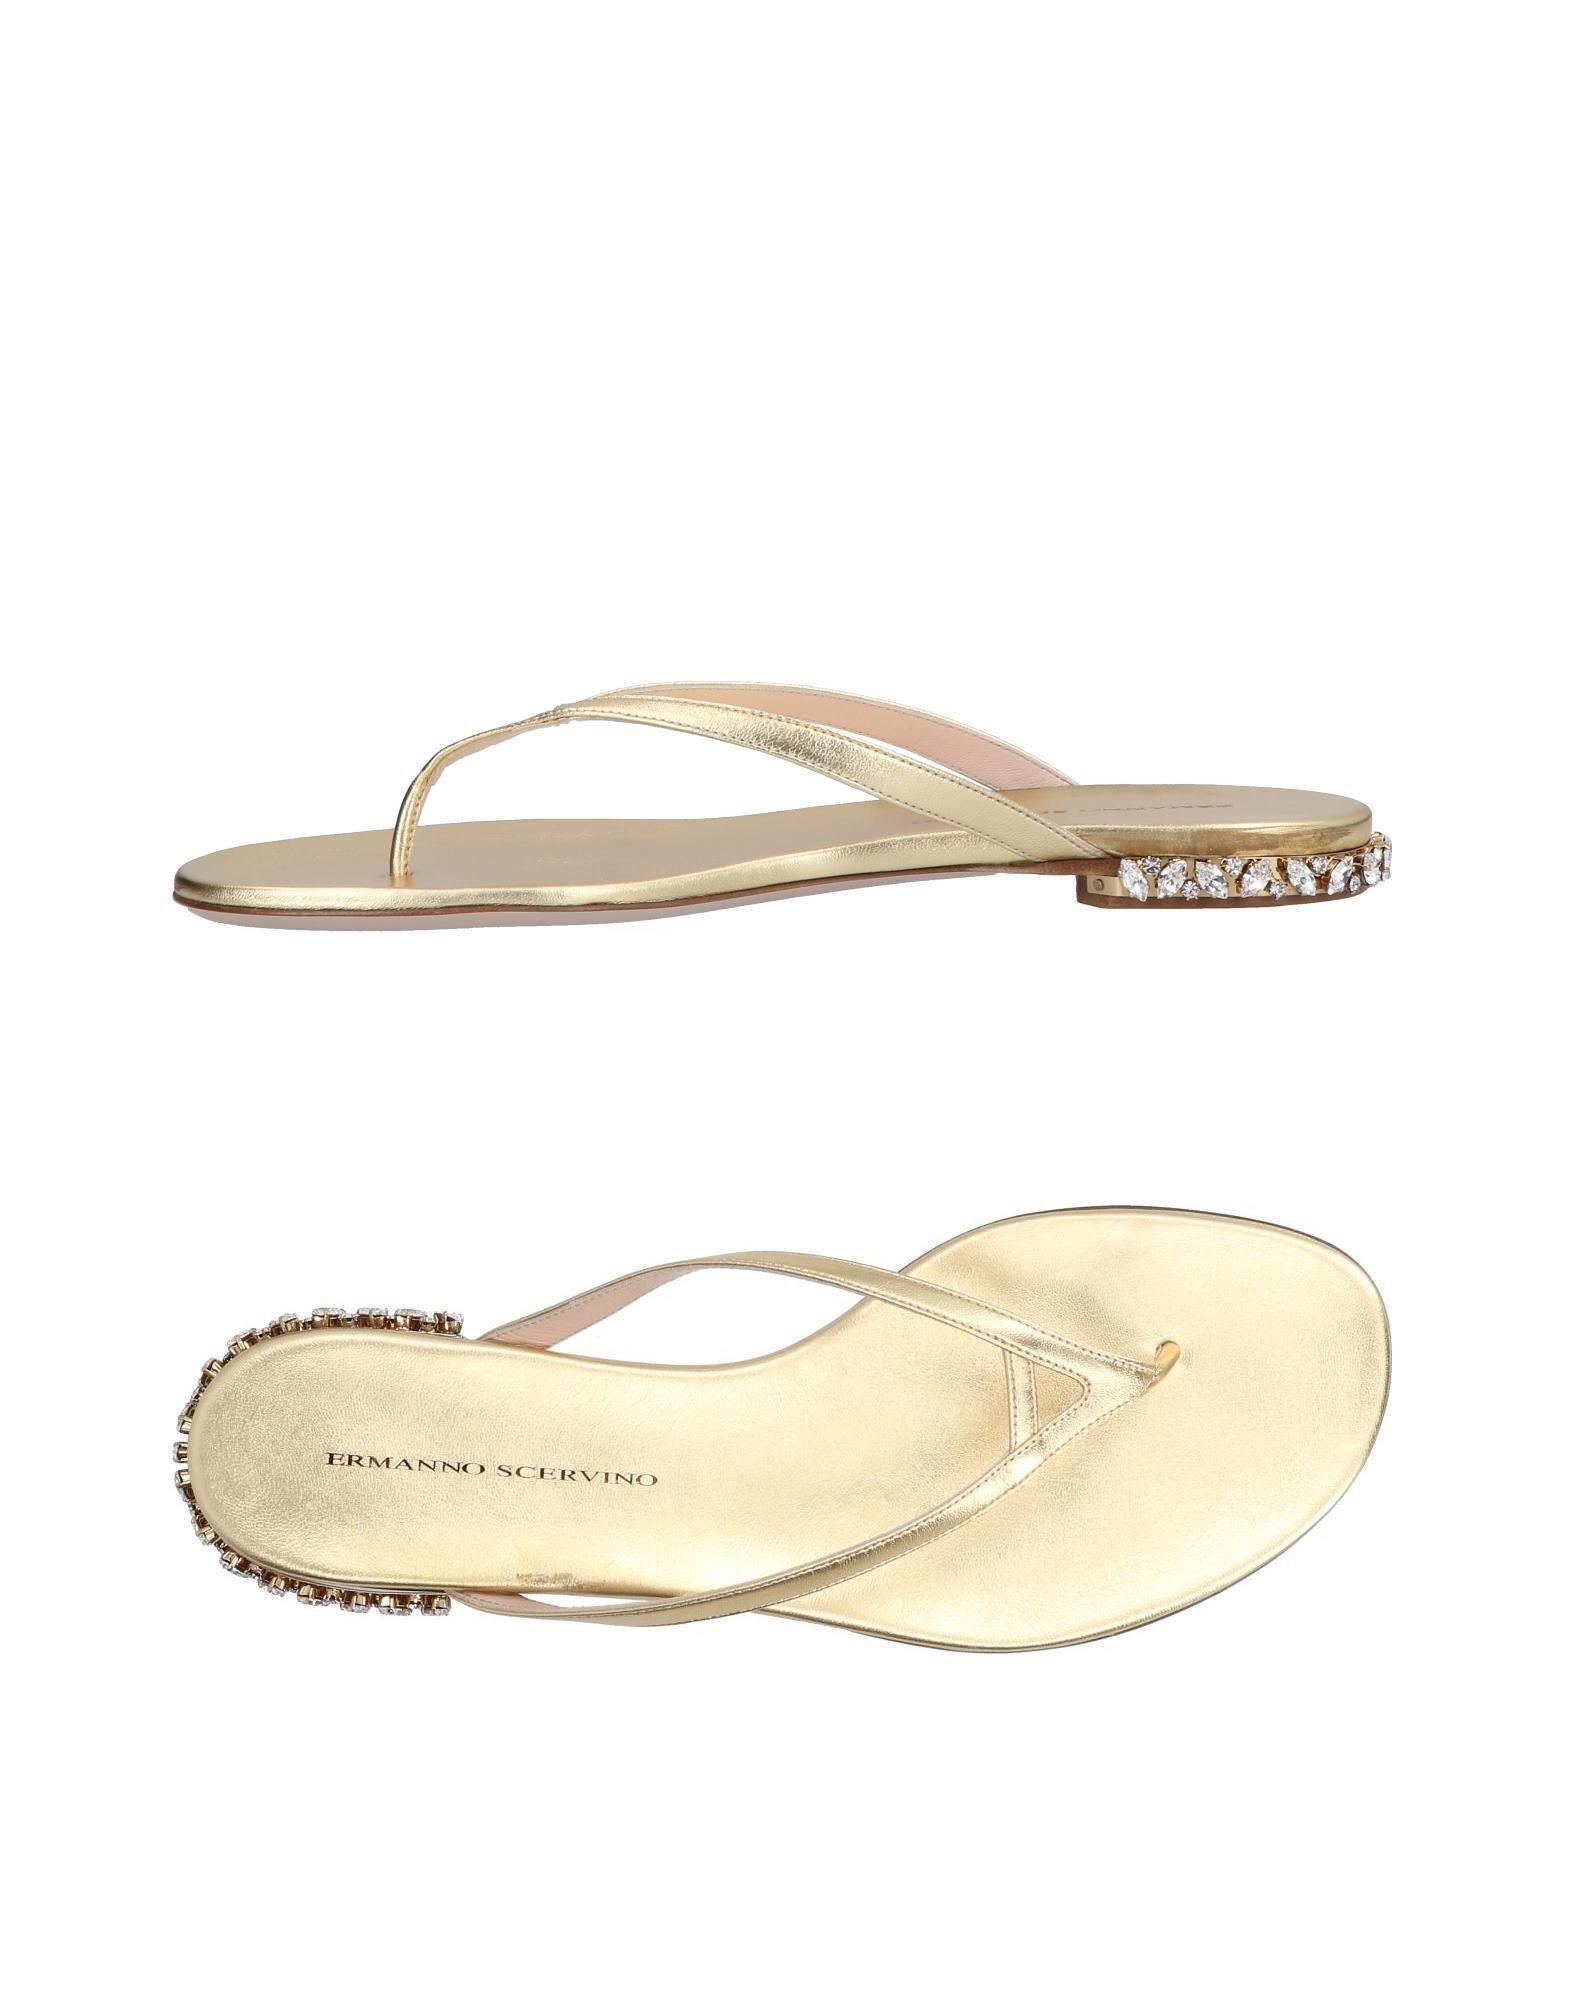 Chaussures - Sandales Entredoigt Ermanno De Scervino JzMmVp